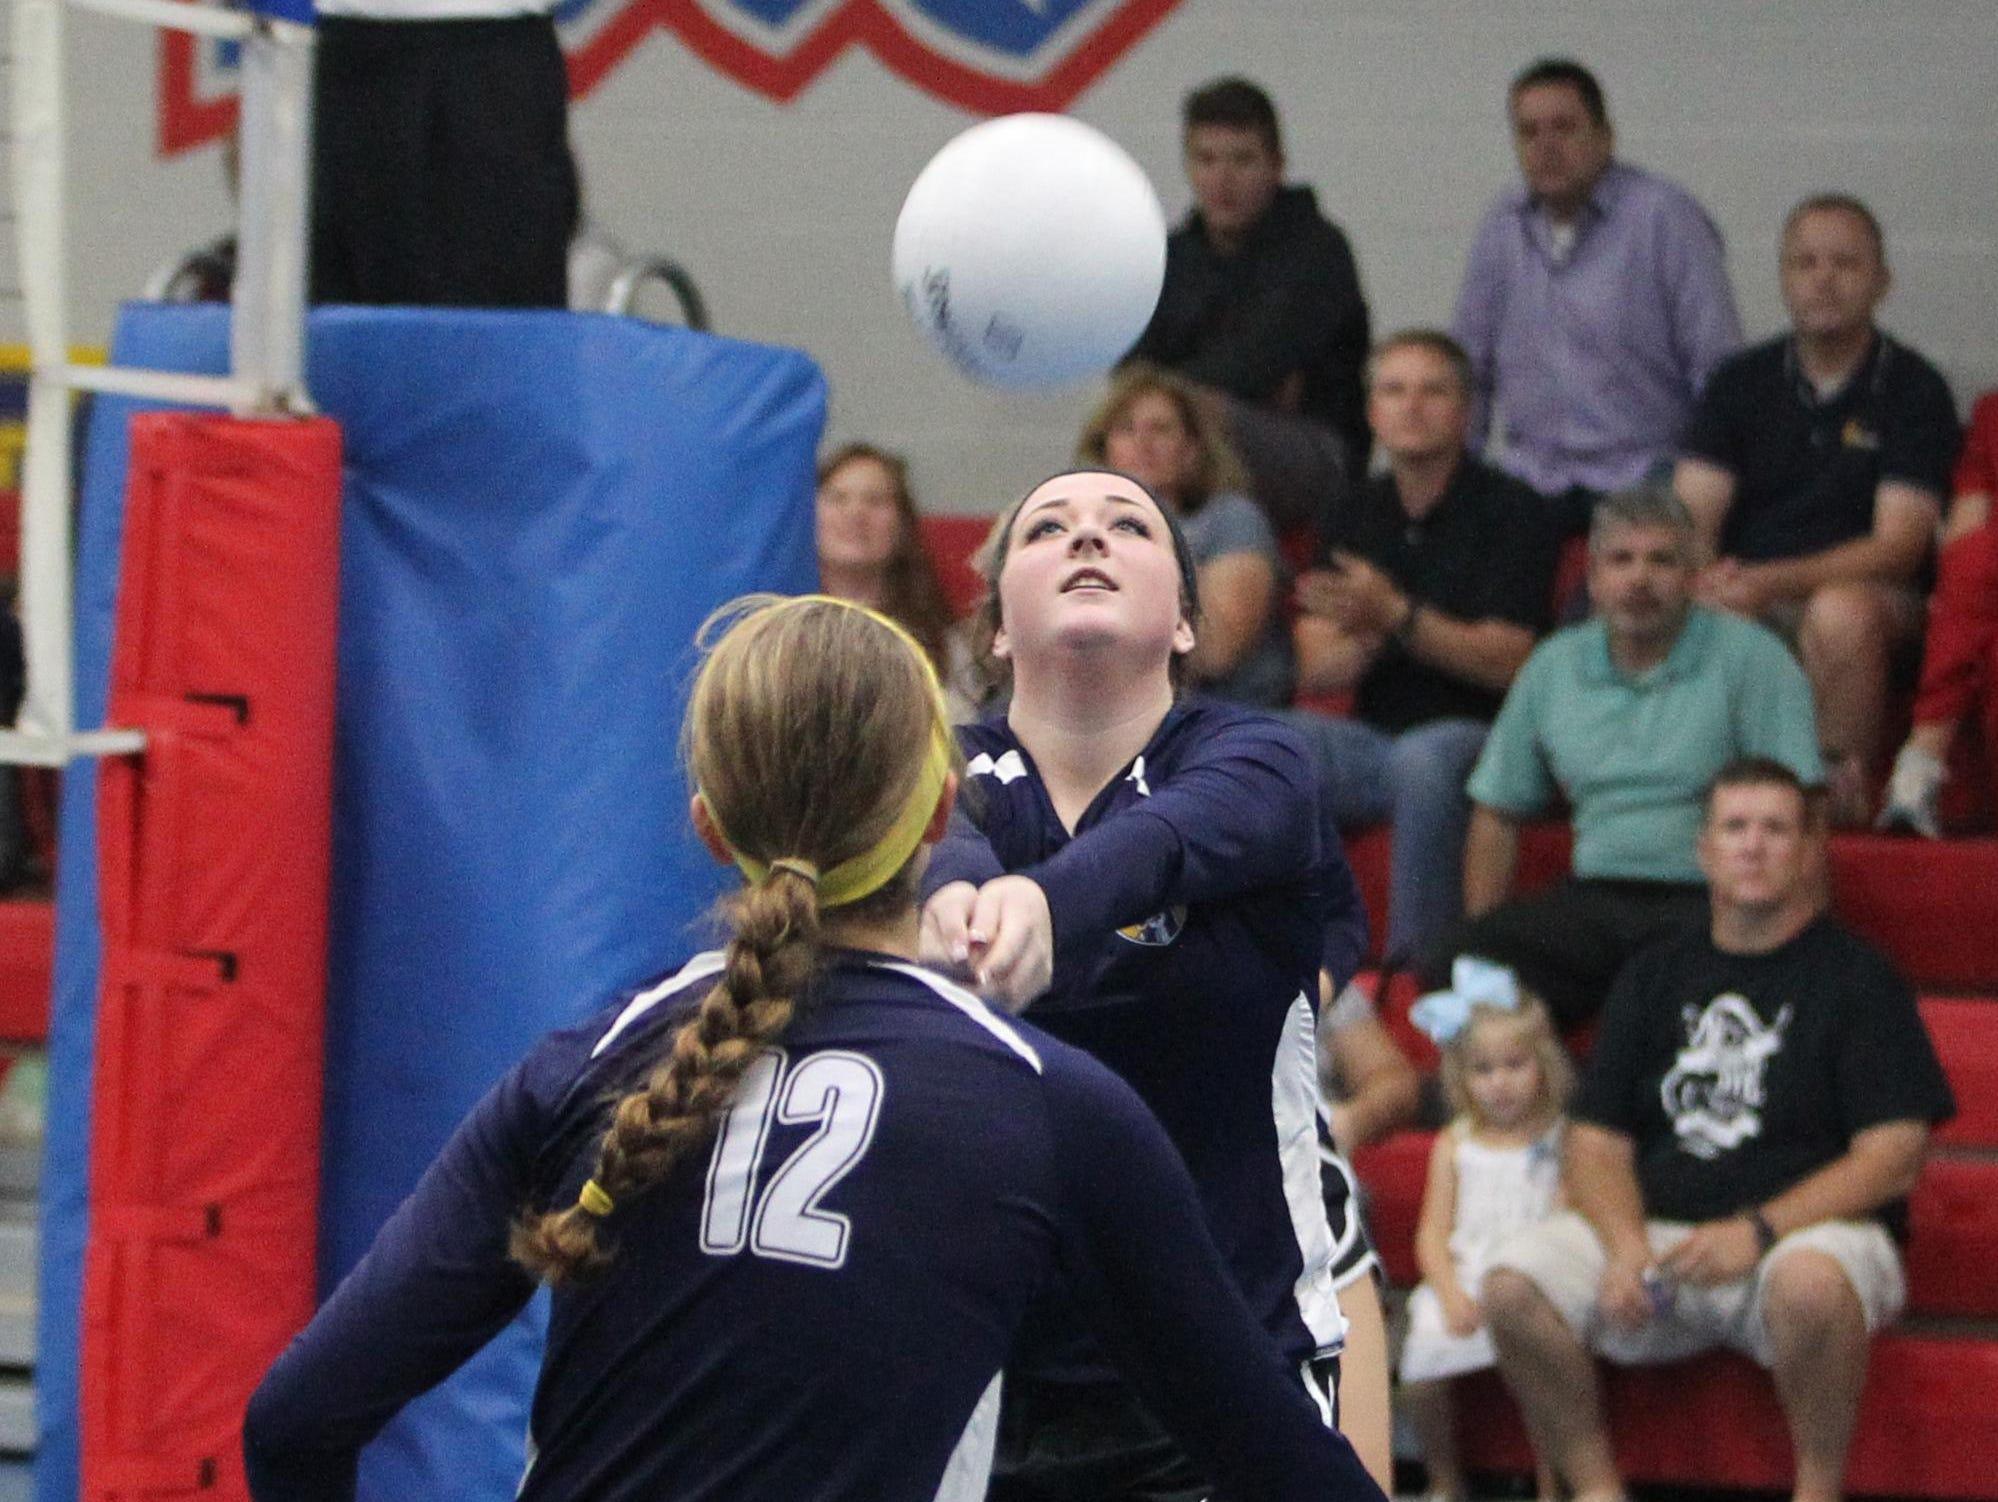 CCS' Savannah Vause tries to get her offense in gear during a Region 1-2A quarterfinal playoff game against Christ's Church Academy.